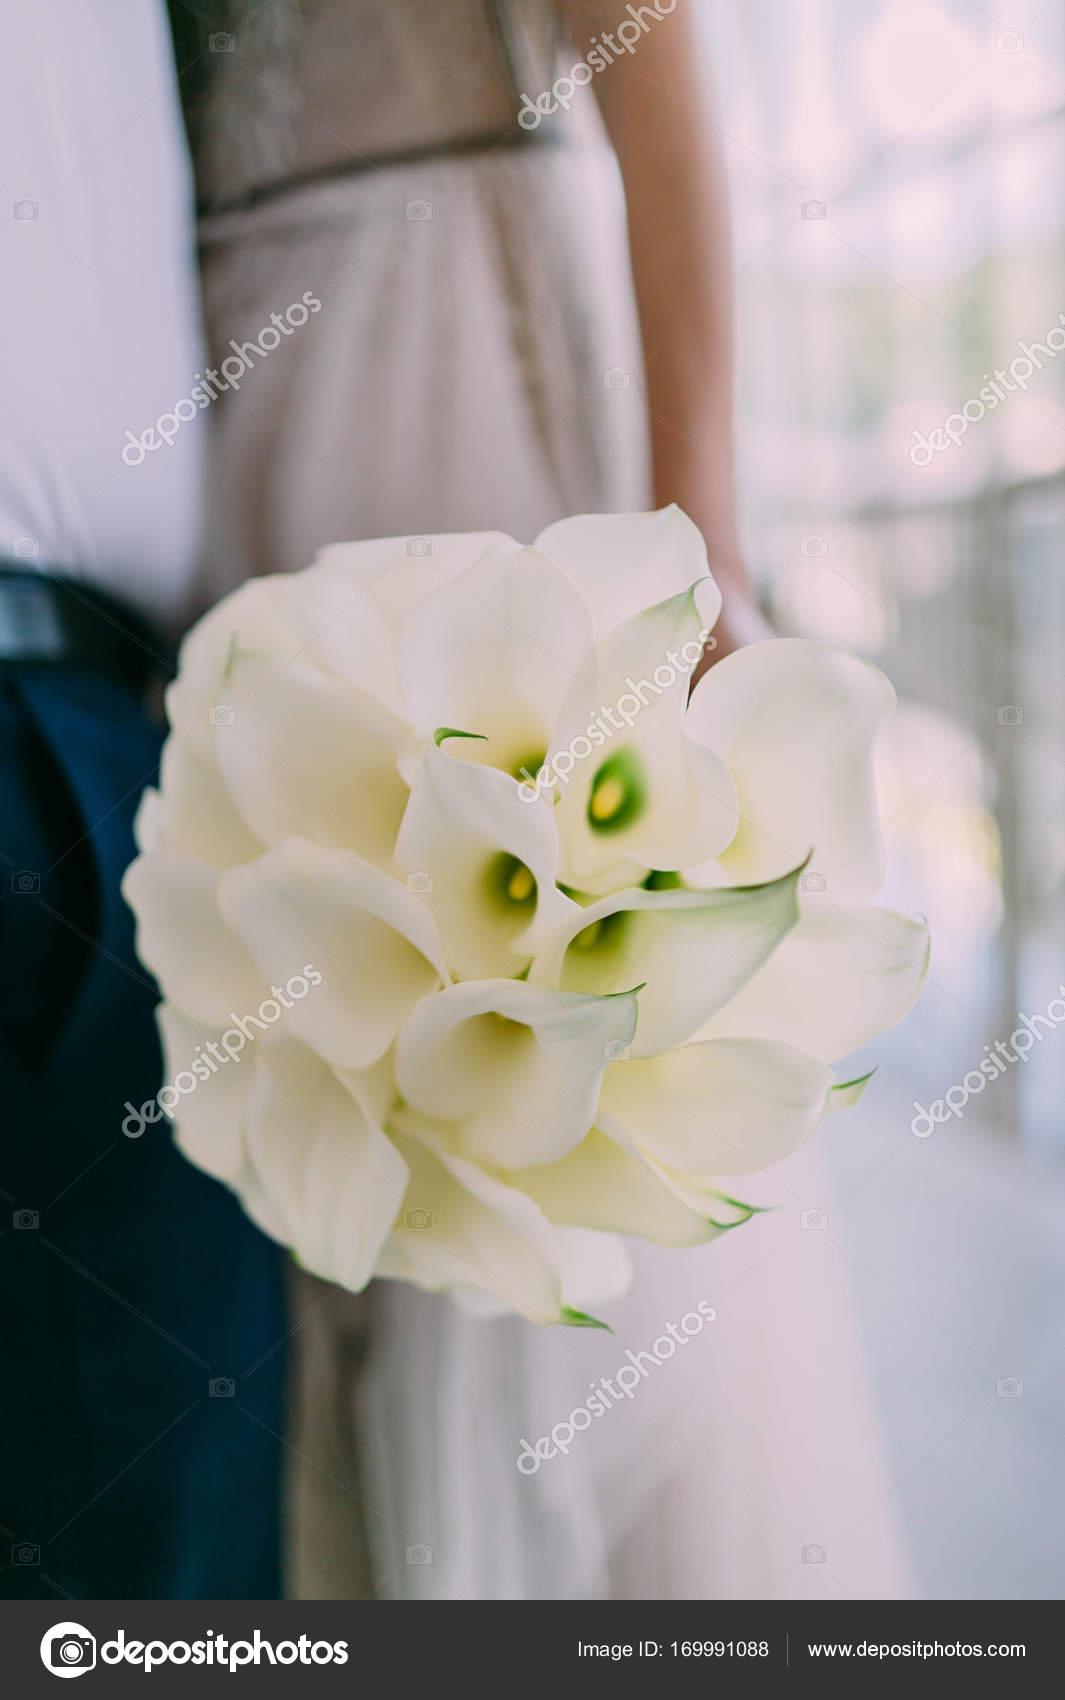 Beautiful wedding bouquet of calla flowers in hands of the bride beautiful wedding bouquet of calla flowers in hands of the bride artwork soft focus izmirmasajfo